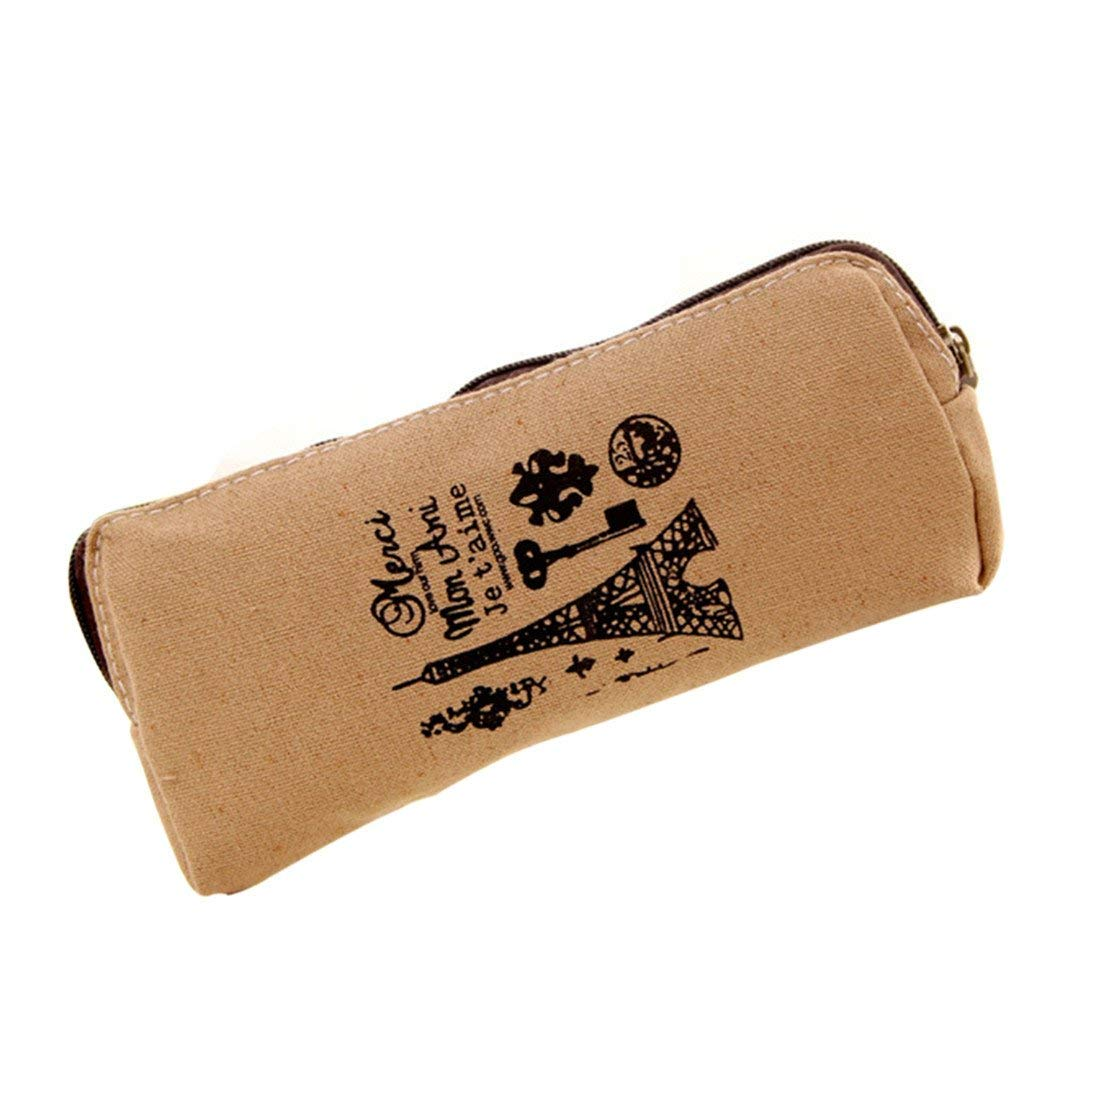 ASKCUT Pen Pencil Case,Retro Paris Style Cotton and Linen Canvas Large-capacity Multifunctional Storage Bag Creative Pure Color Stationery Bag (Light brown)